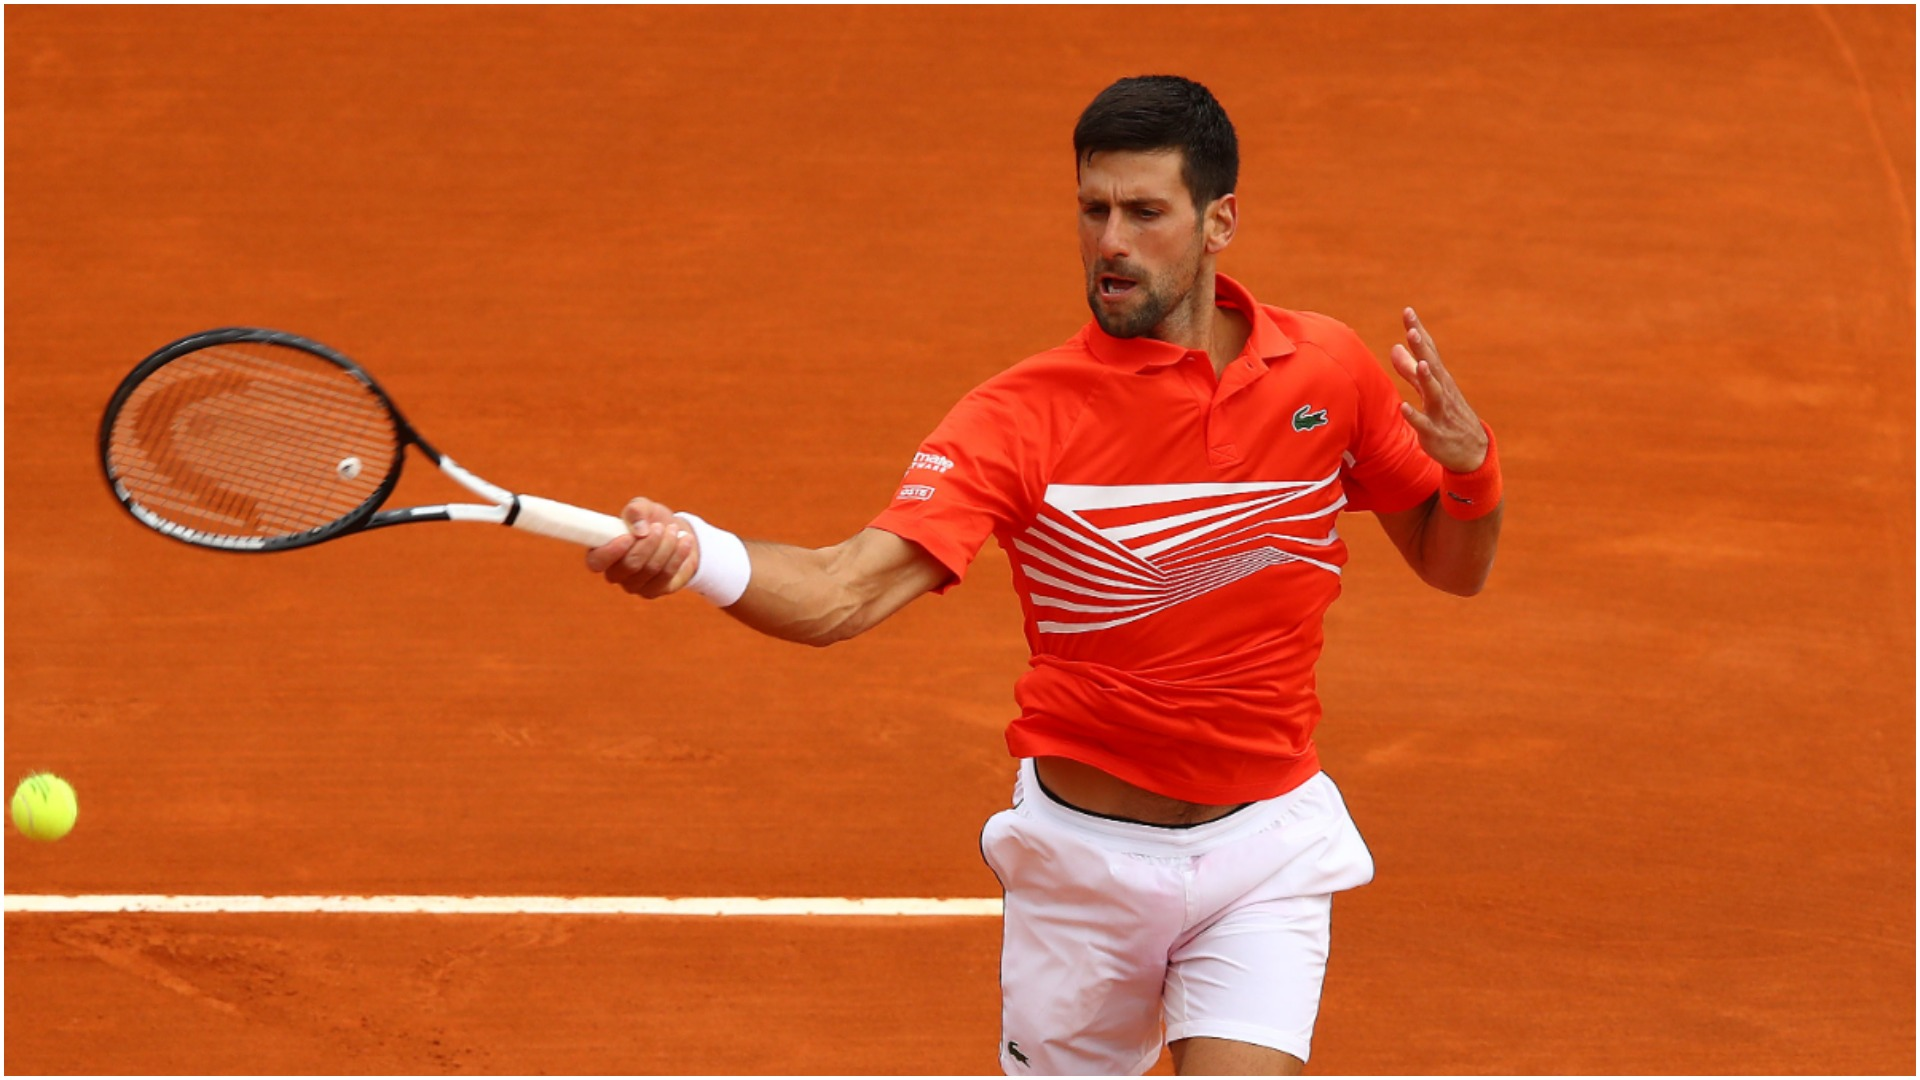 Off-colour Djokovic scrapes past Indian Wells foe Kohlschreiber